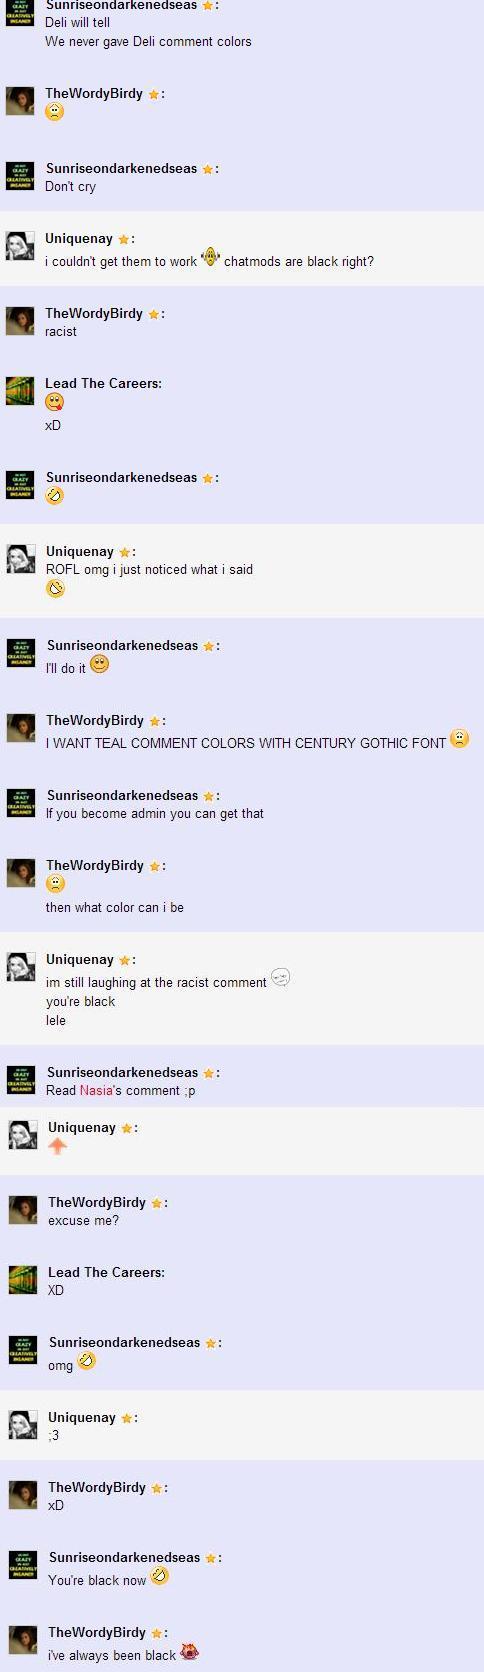 Racistcommentcolor